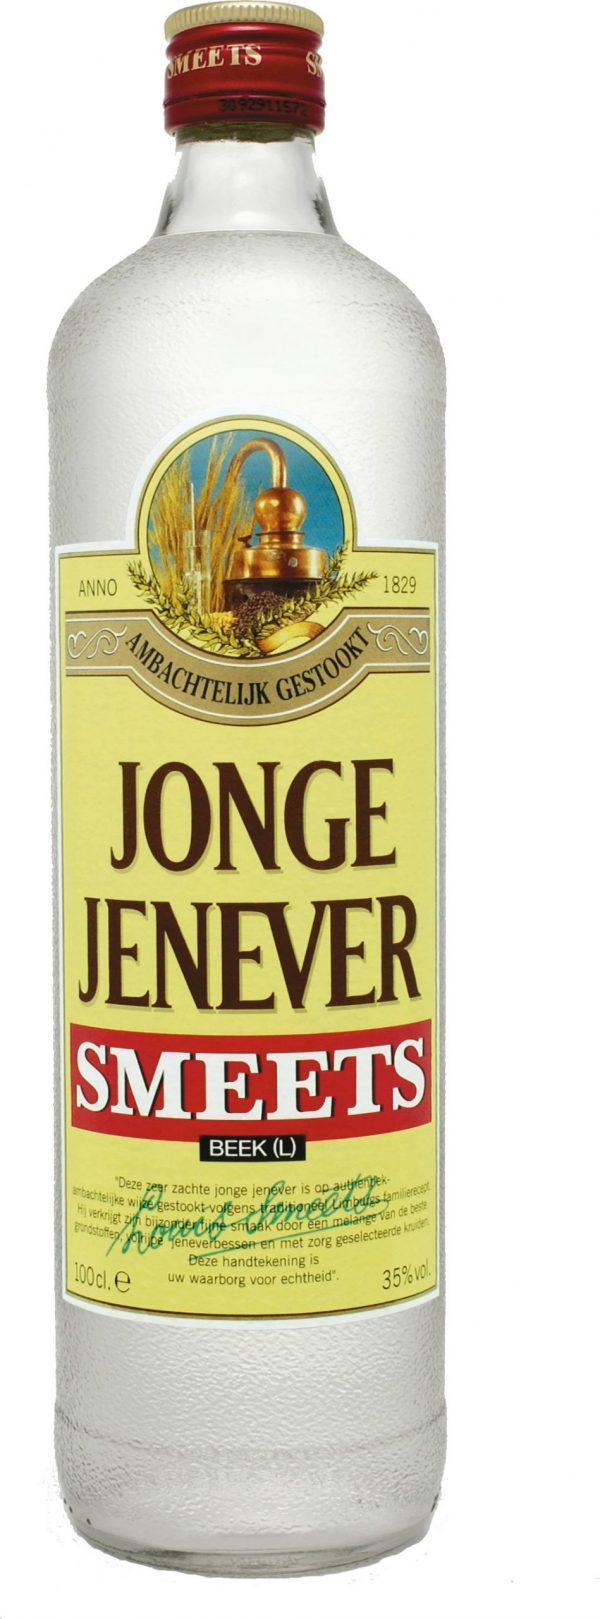 FLES SMEETS JONGE JENEVER 1.00 LTR-0